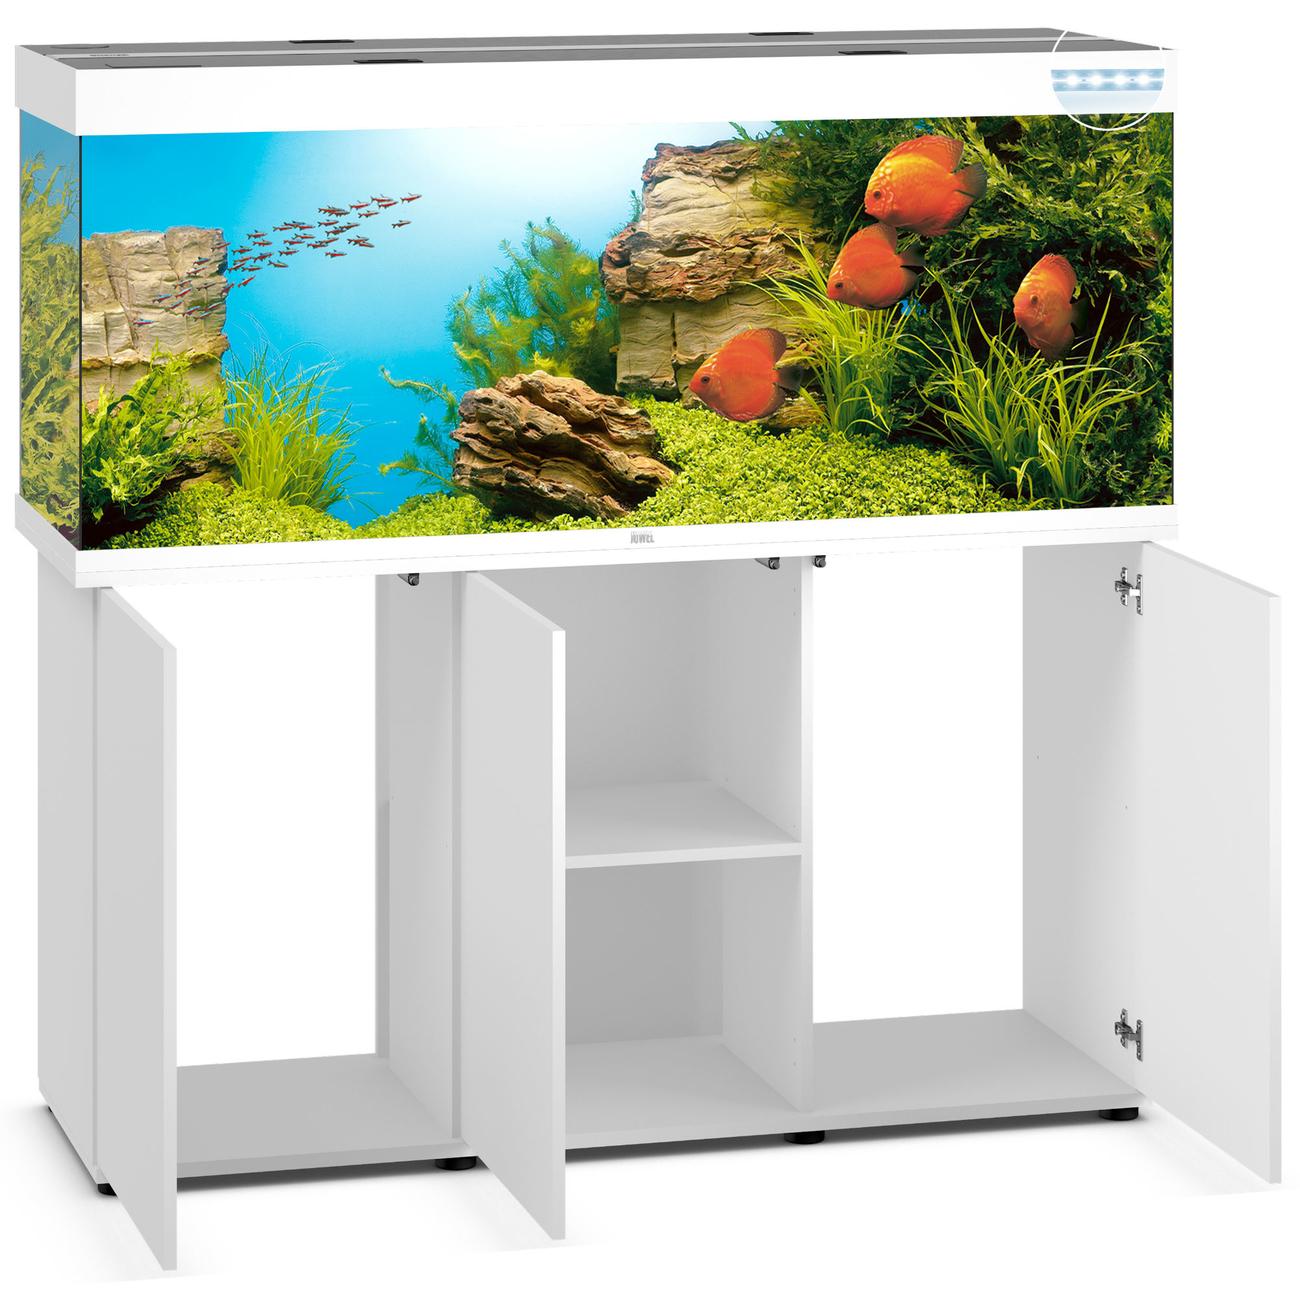 Juwel Rio 450 LED Aquarium mit Unterschrank, Bild 9